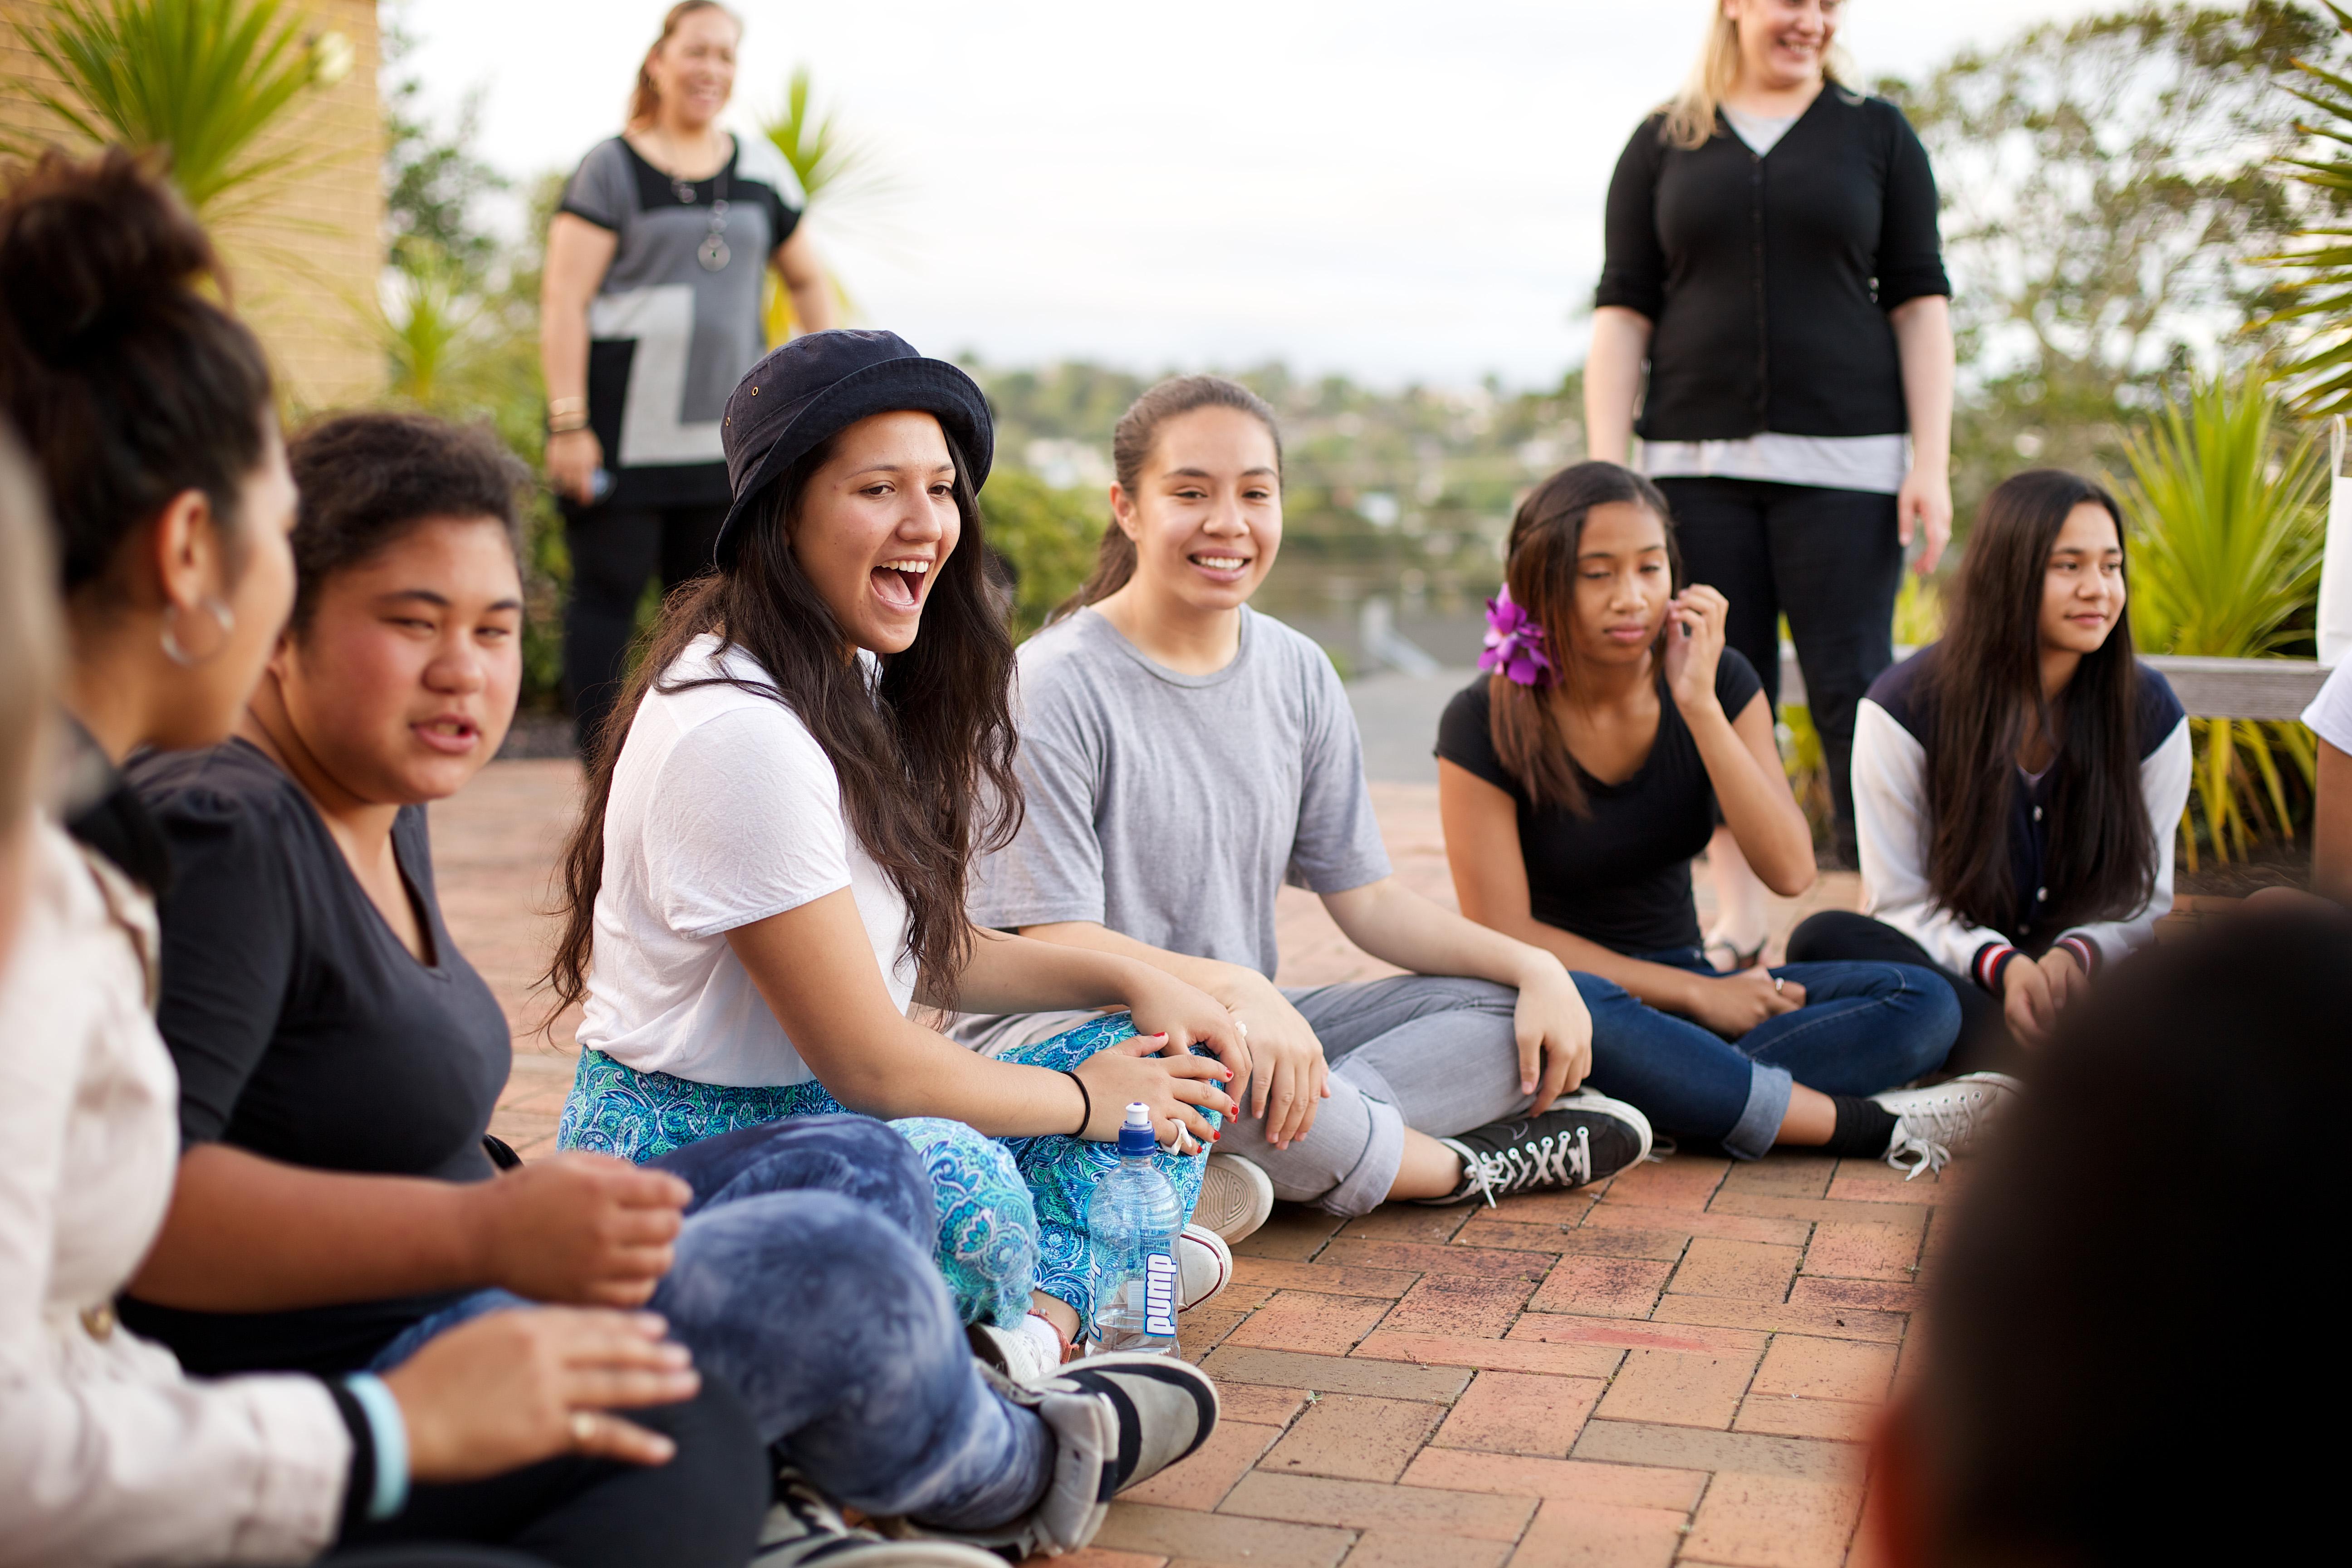 Fun teen group activities